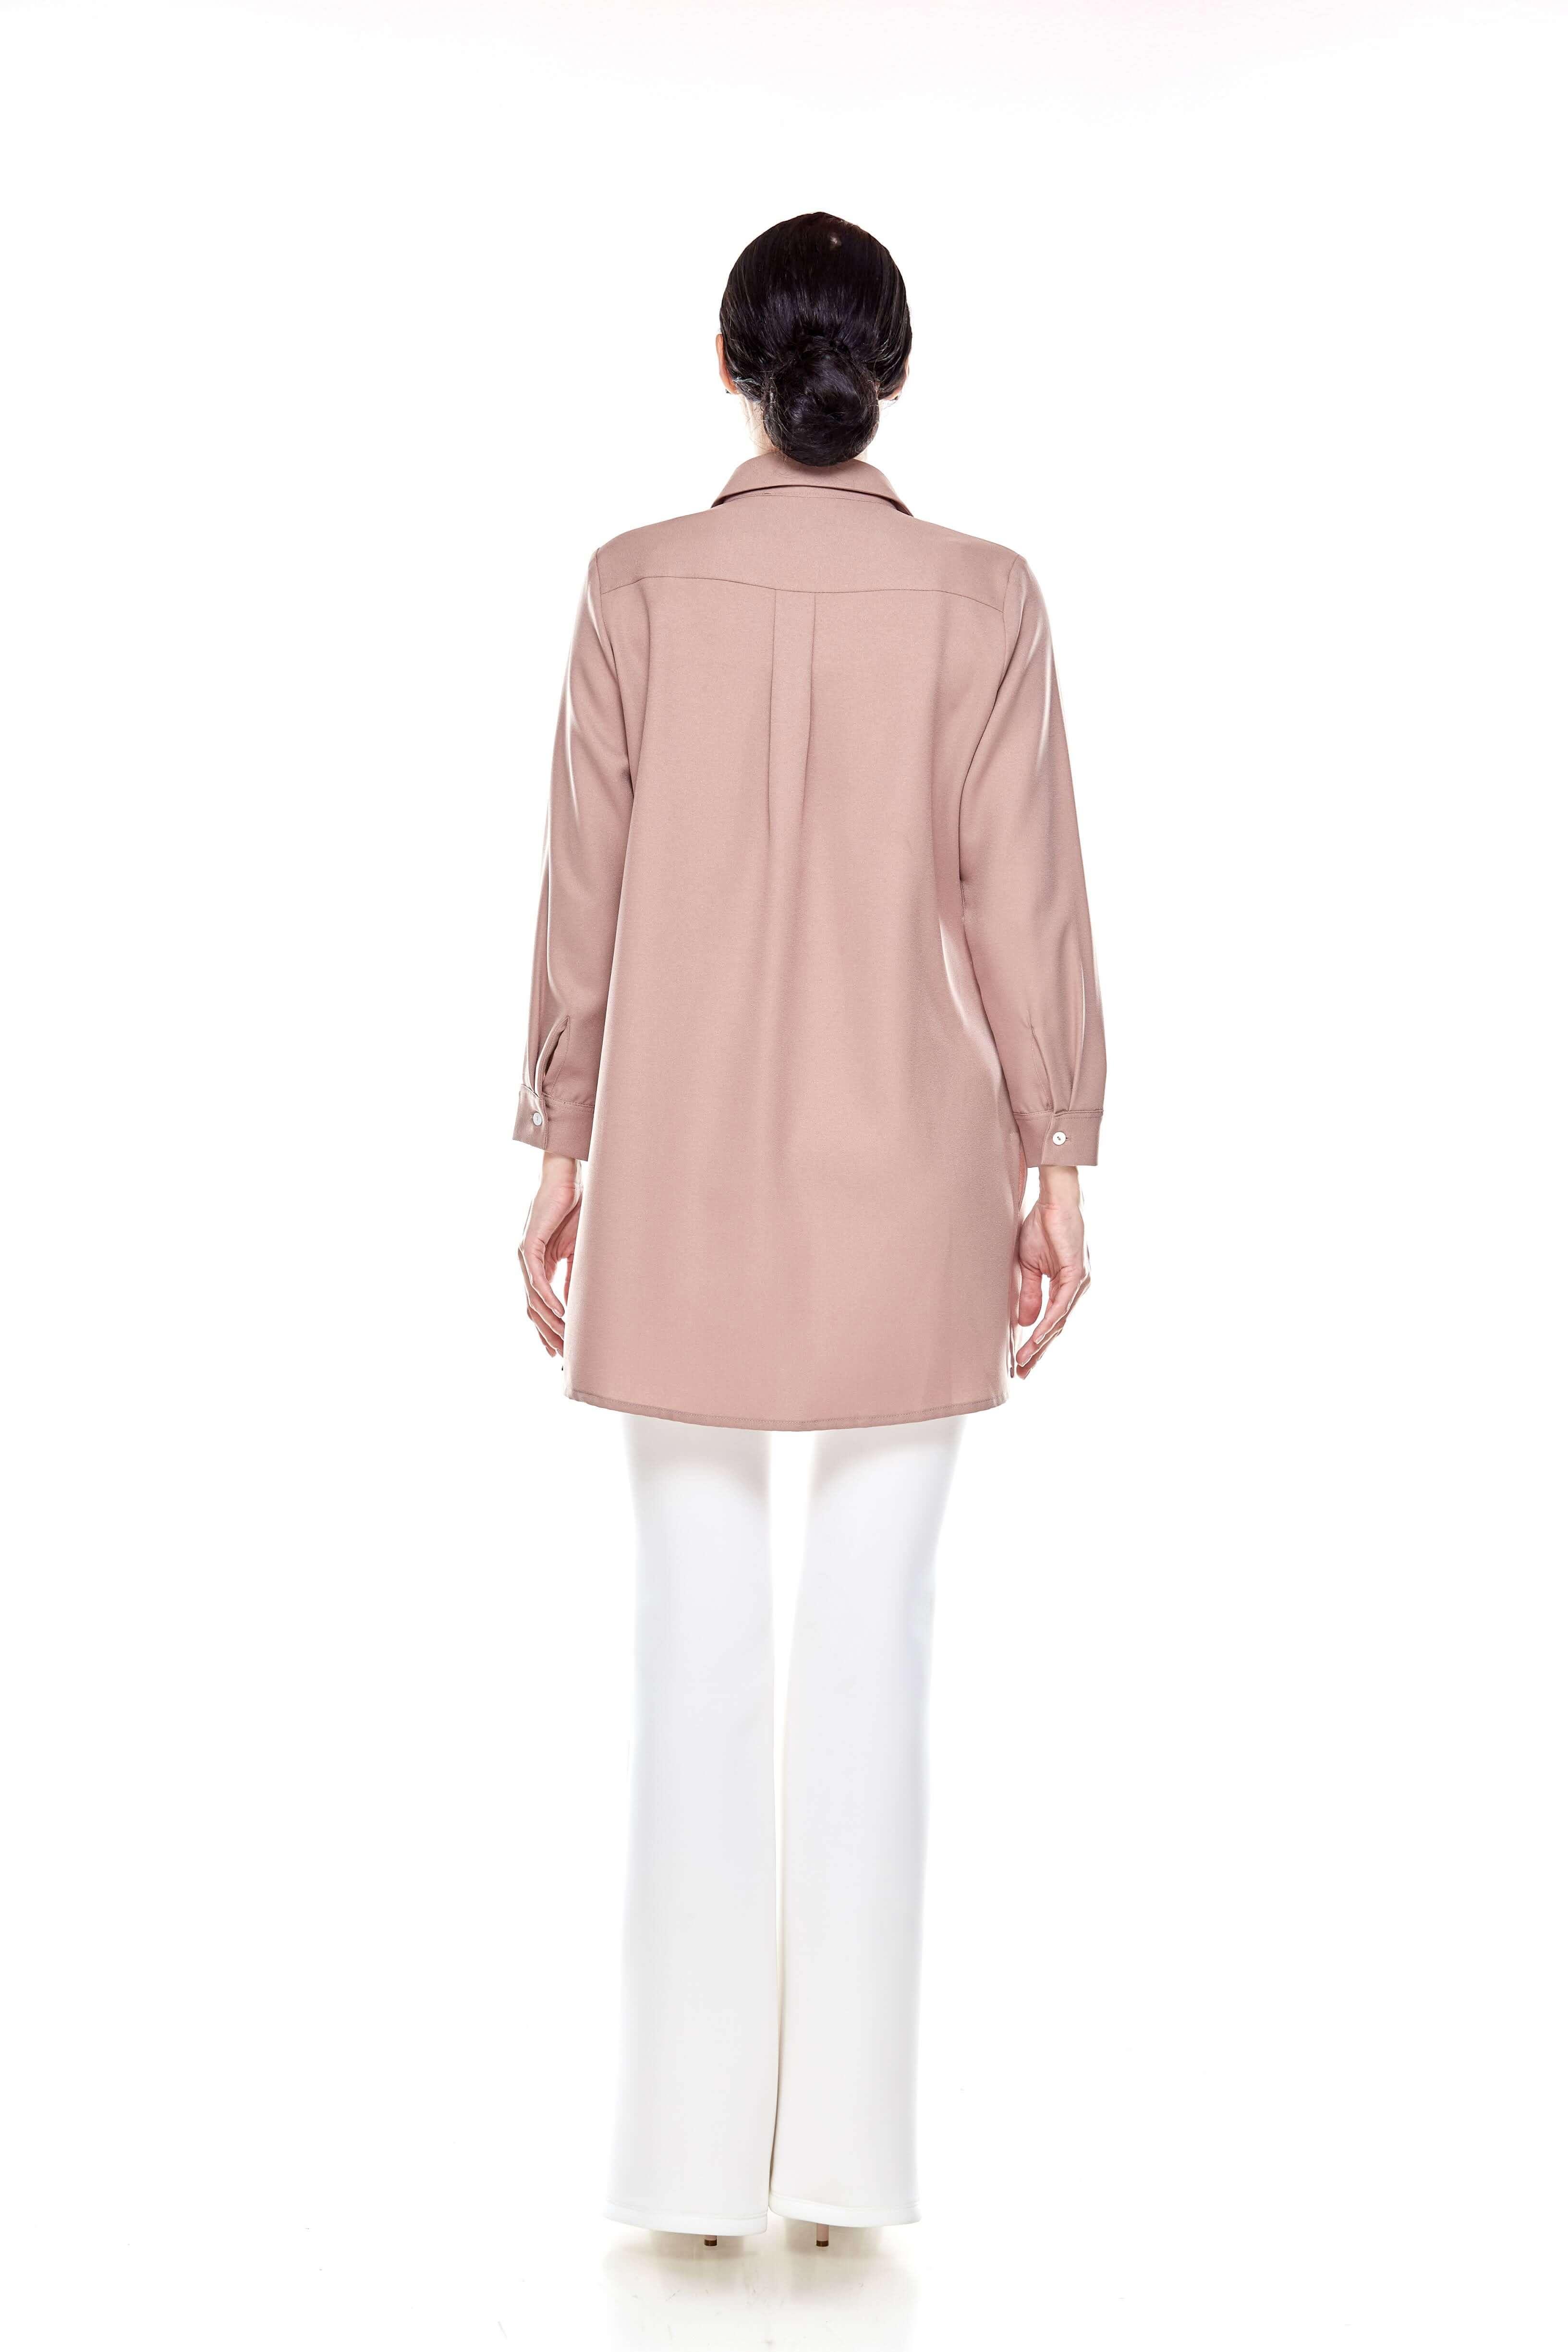 Warm Taupe Shirt Blouse (5)